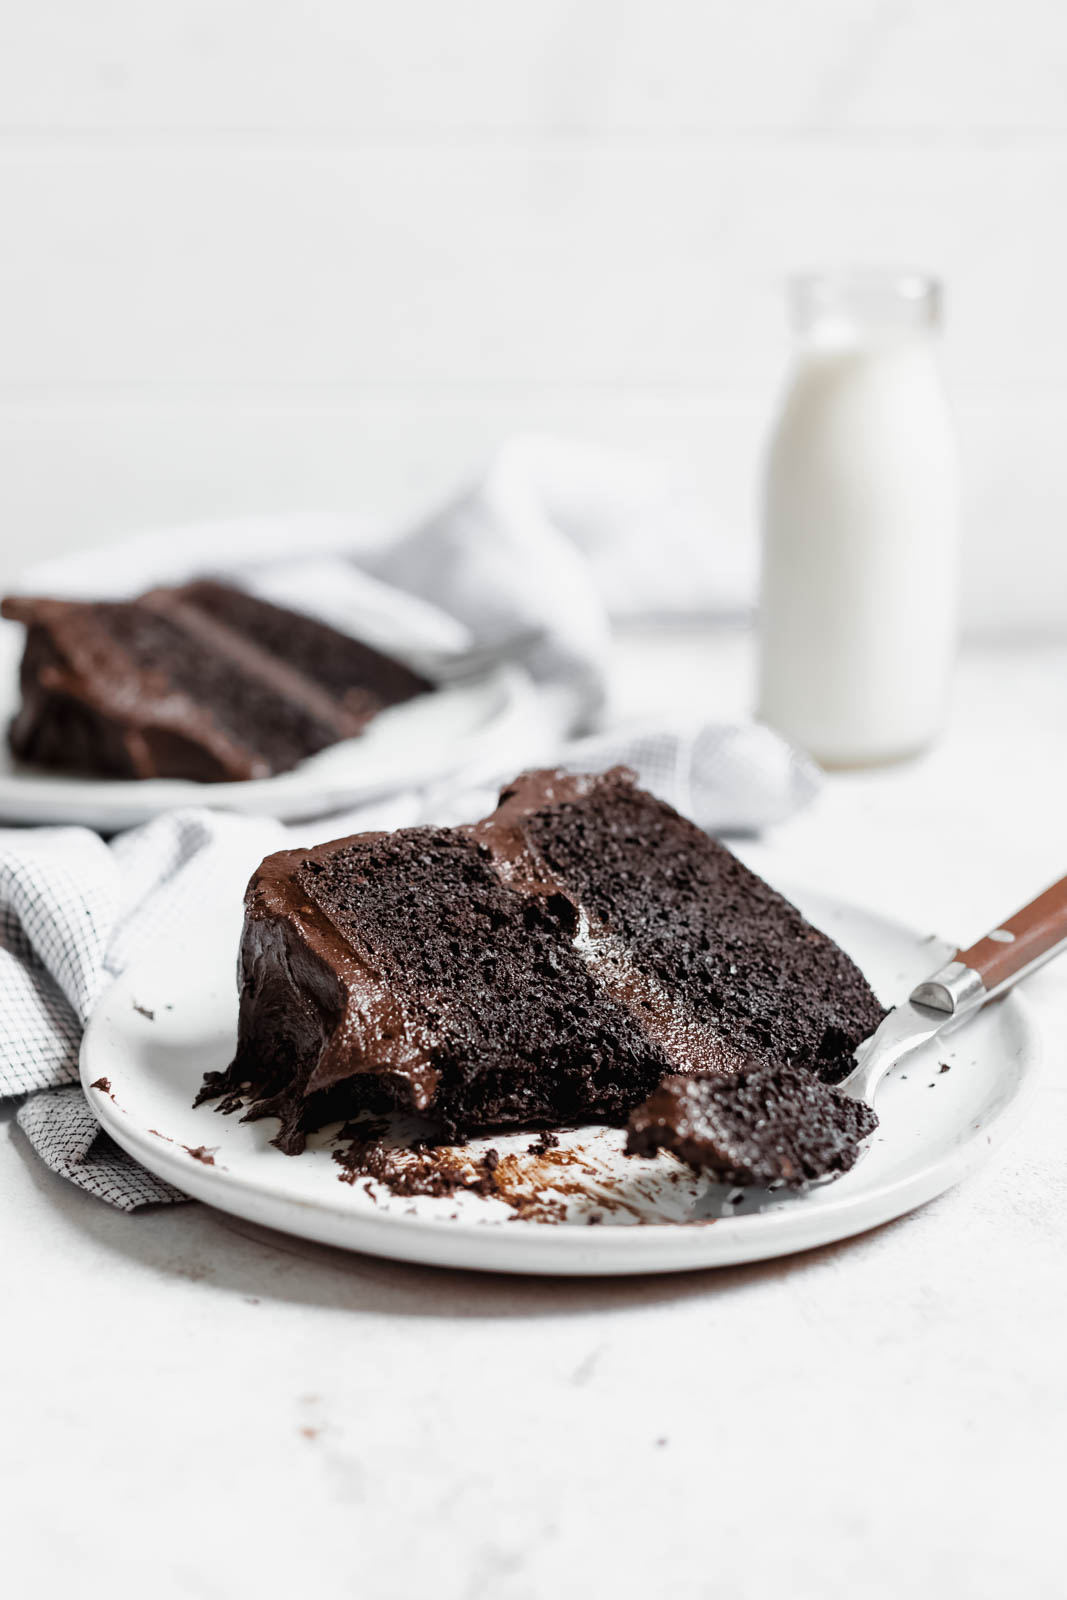 Blackout chocolate cake on plate